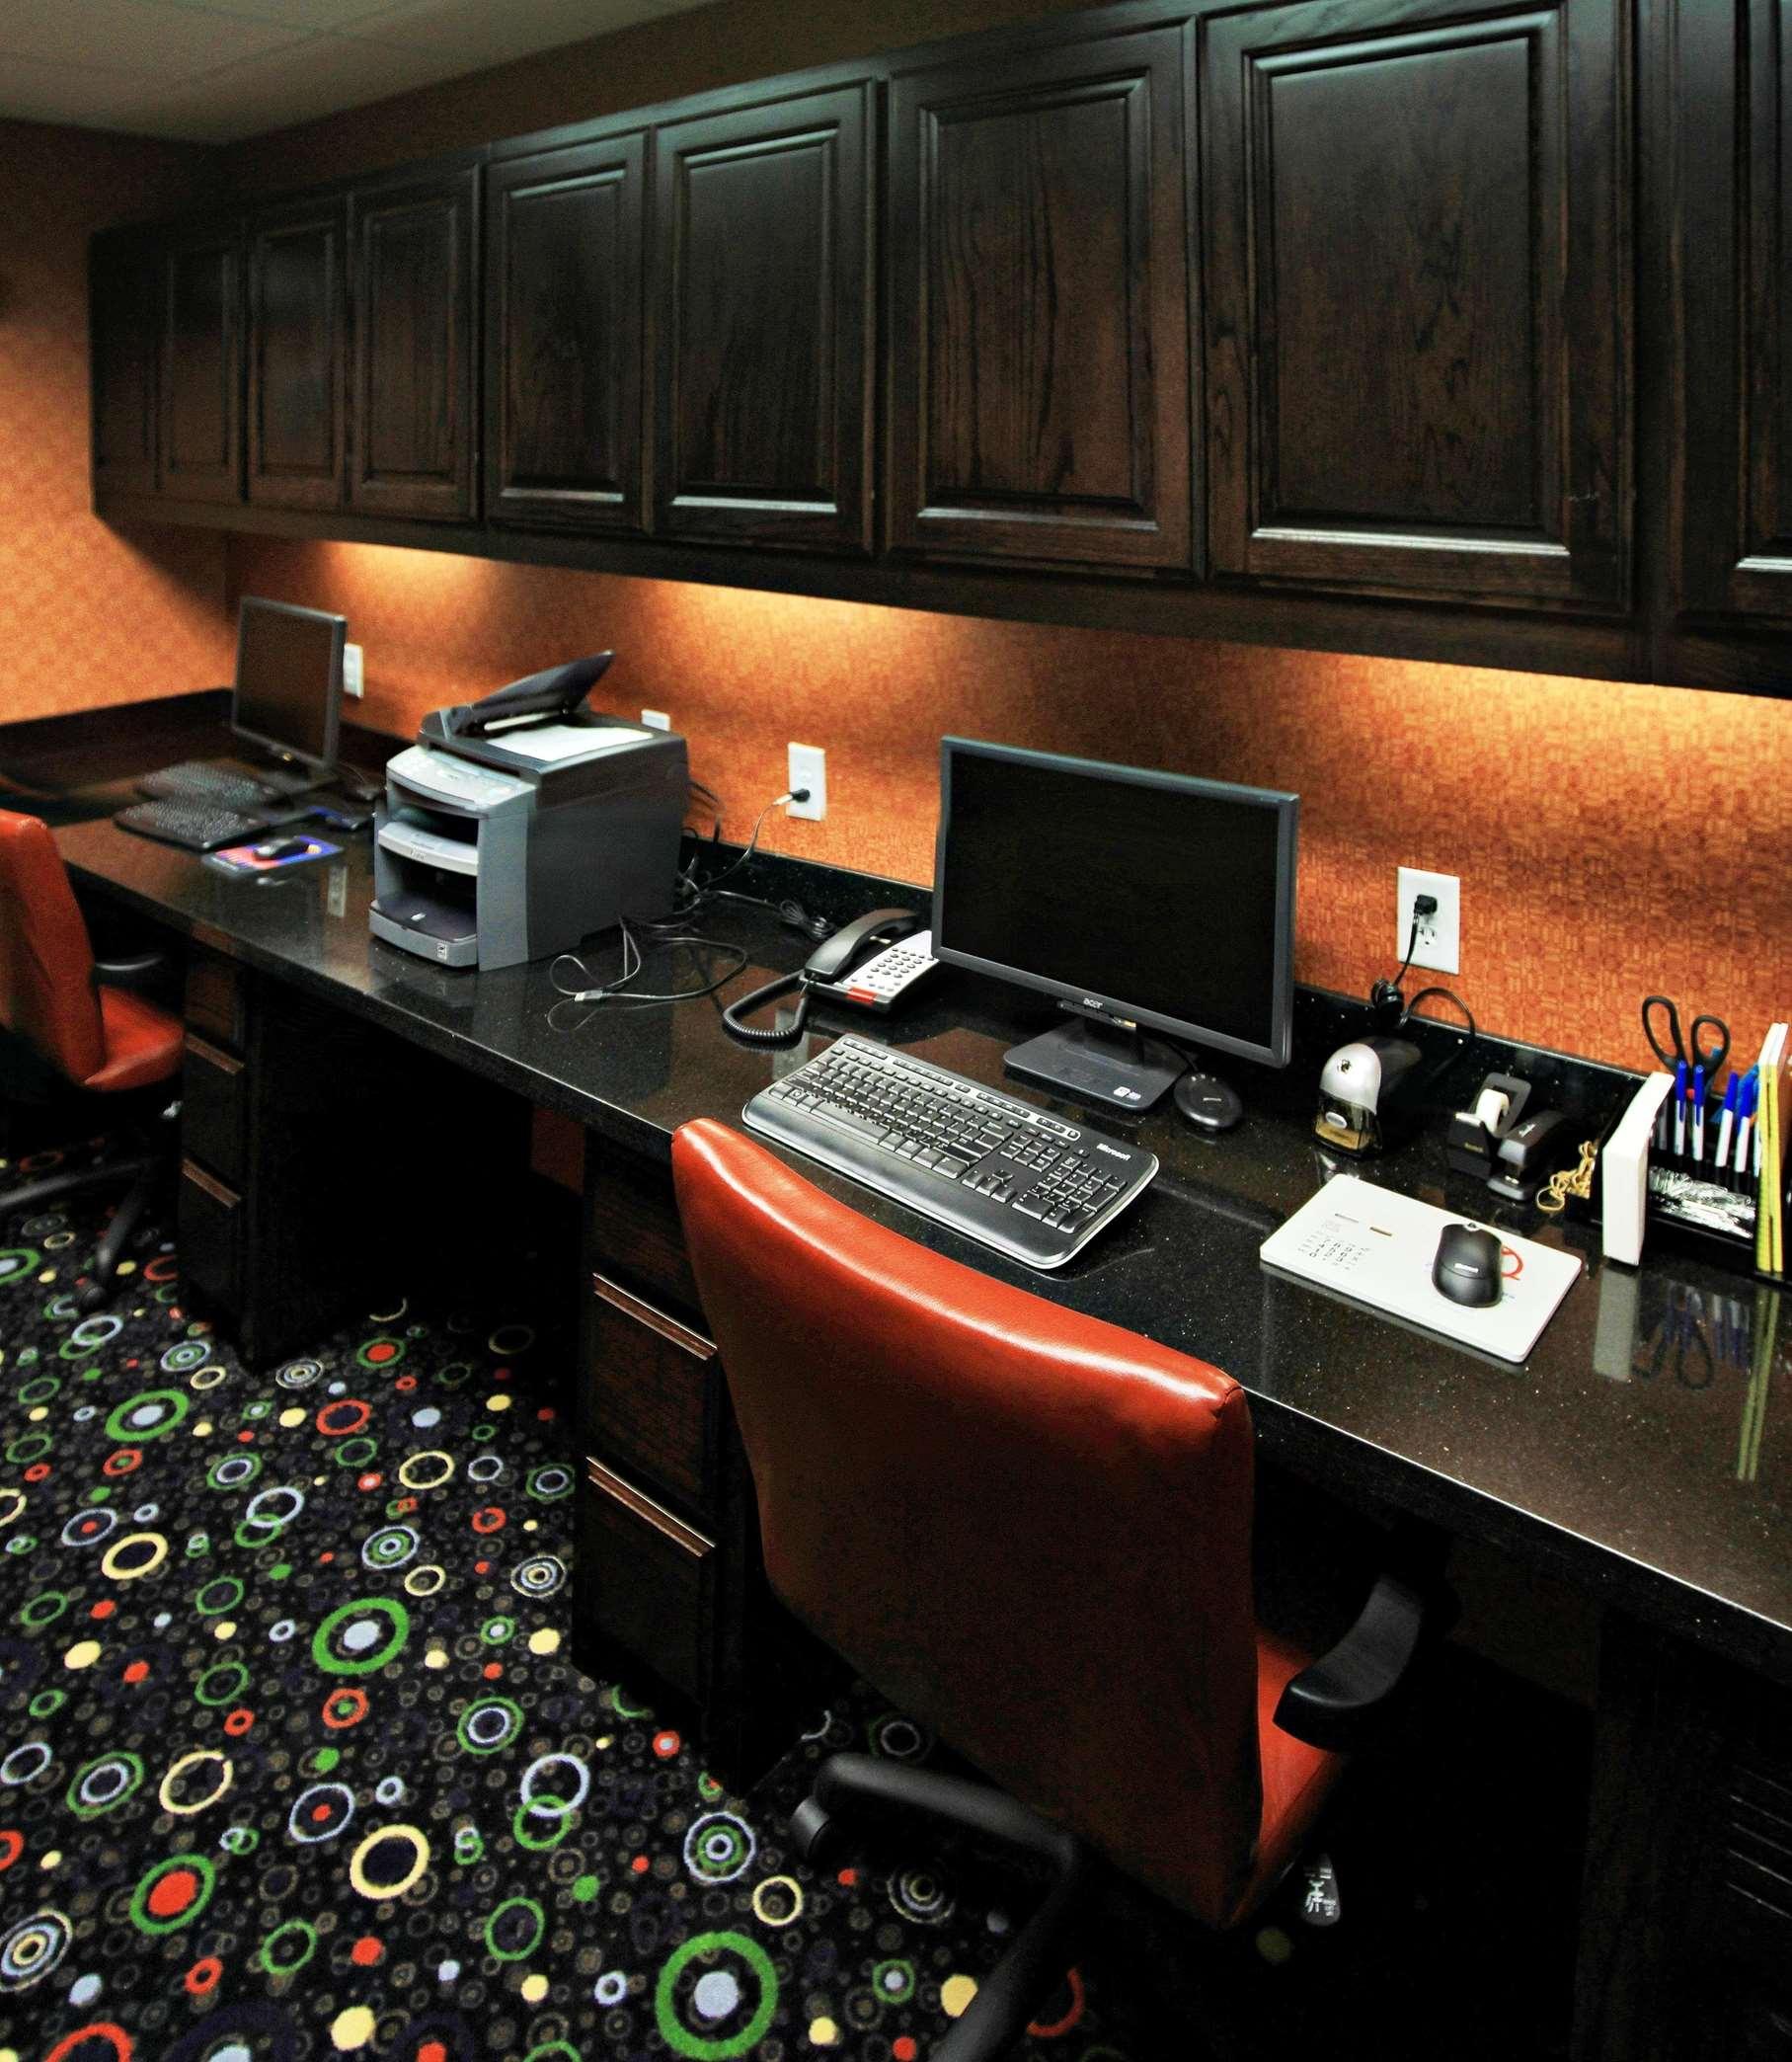 Hampton Inn & Suites Dallas/Lewisville-Vista Ridge Mall, TX image 30